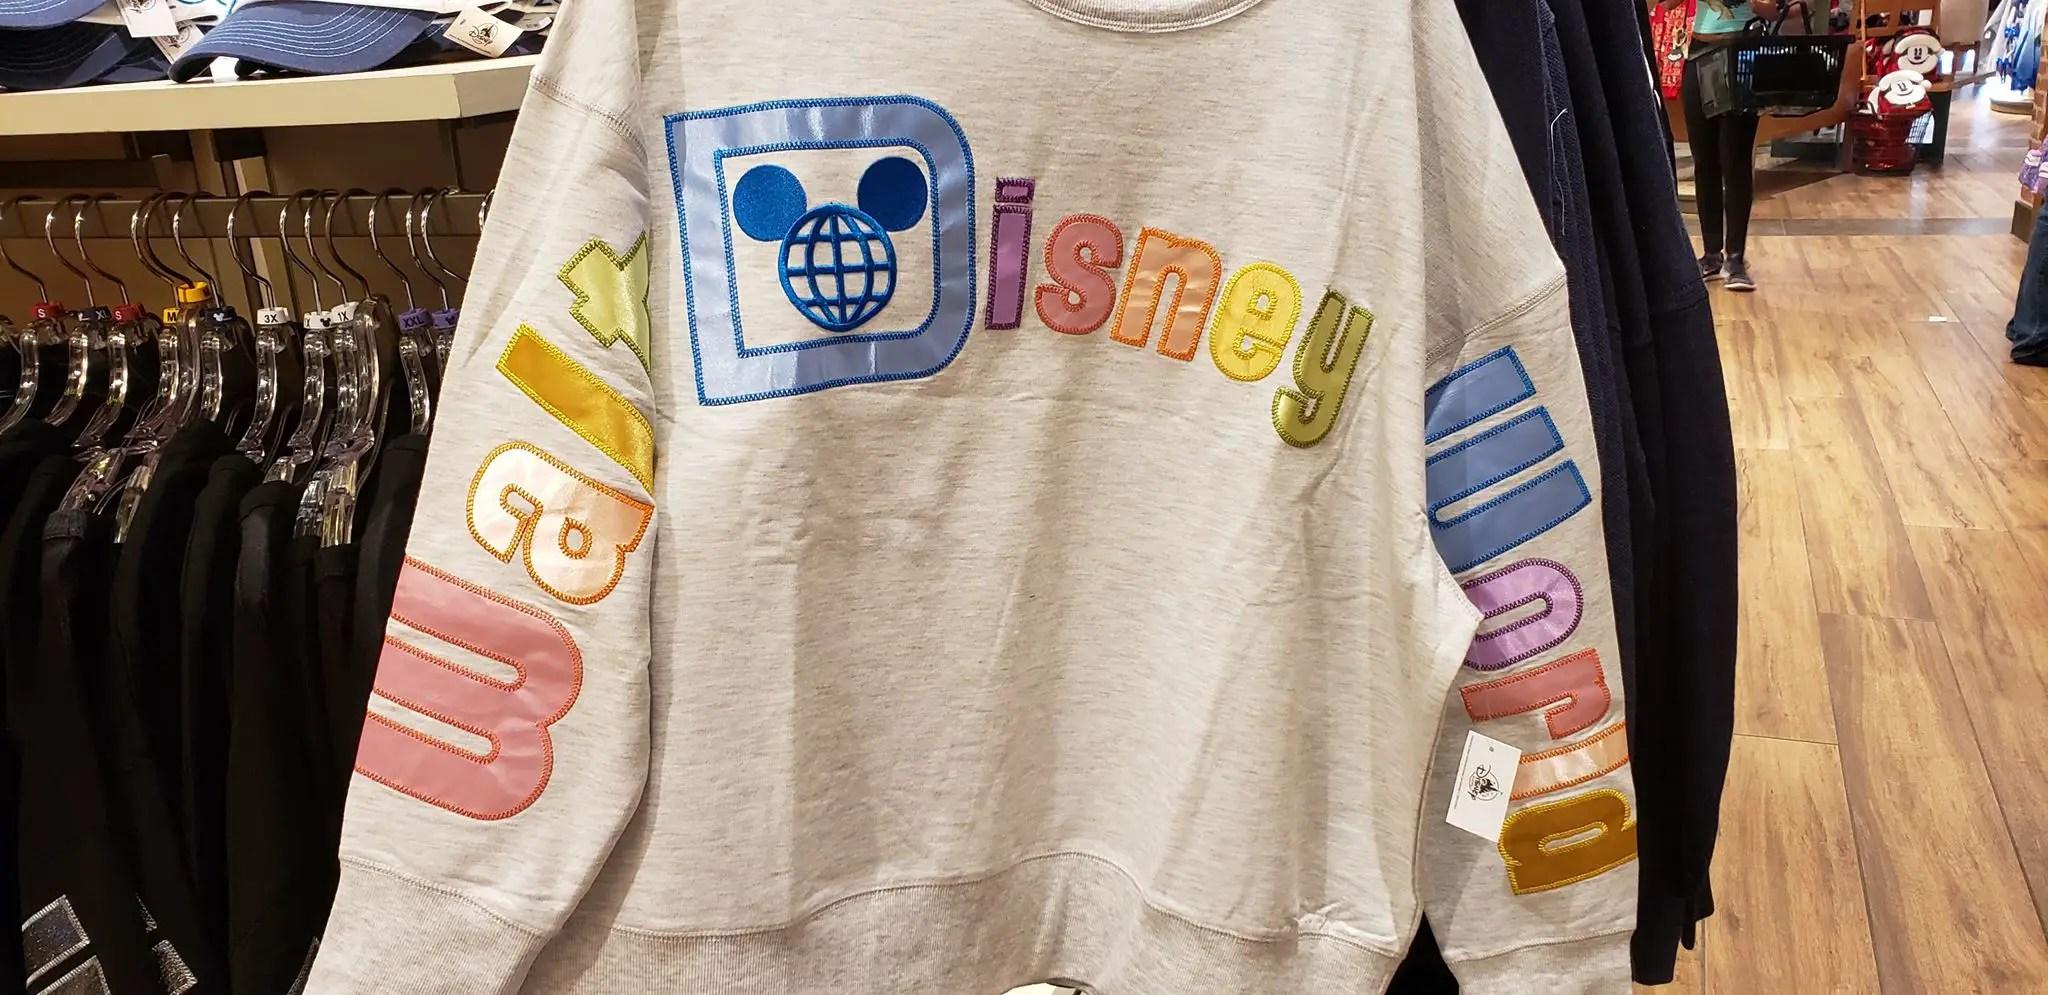 Walt Disney World Sweatshirts Have Cozy Chic Style 3